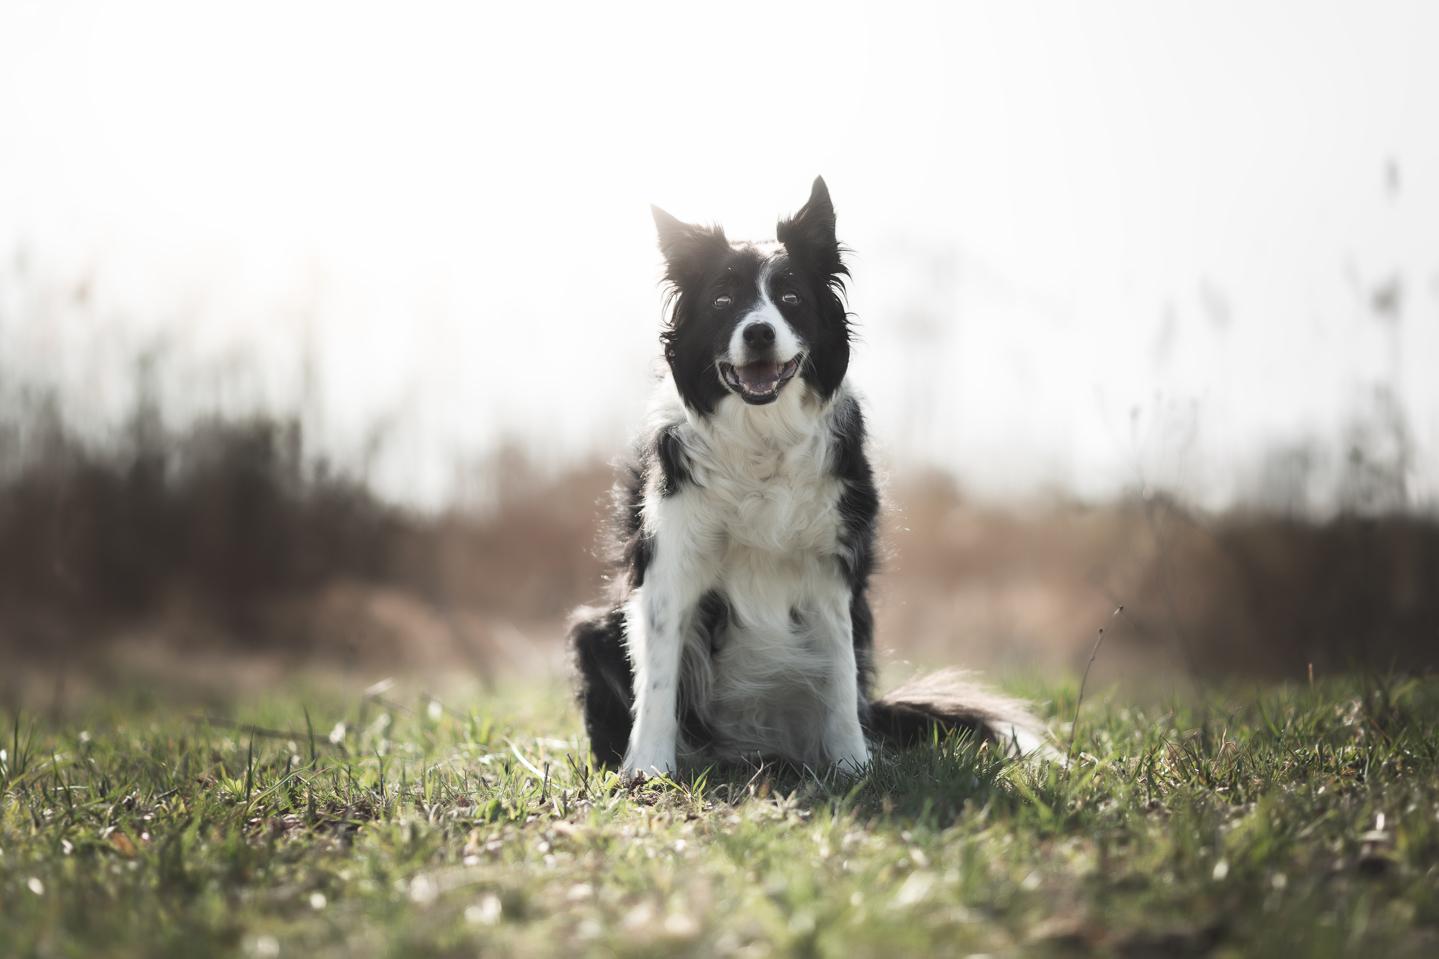 Hundeshooting, Hundefotos, Hundefotografie, Luzern, Tierfotografin Luzern